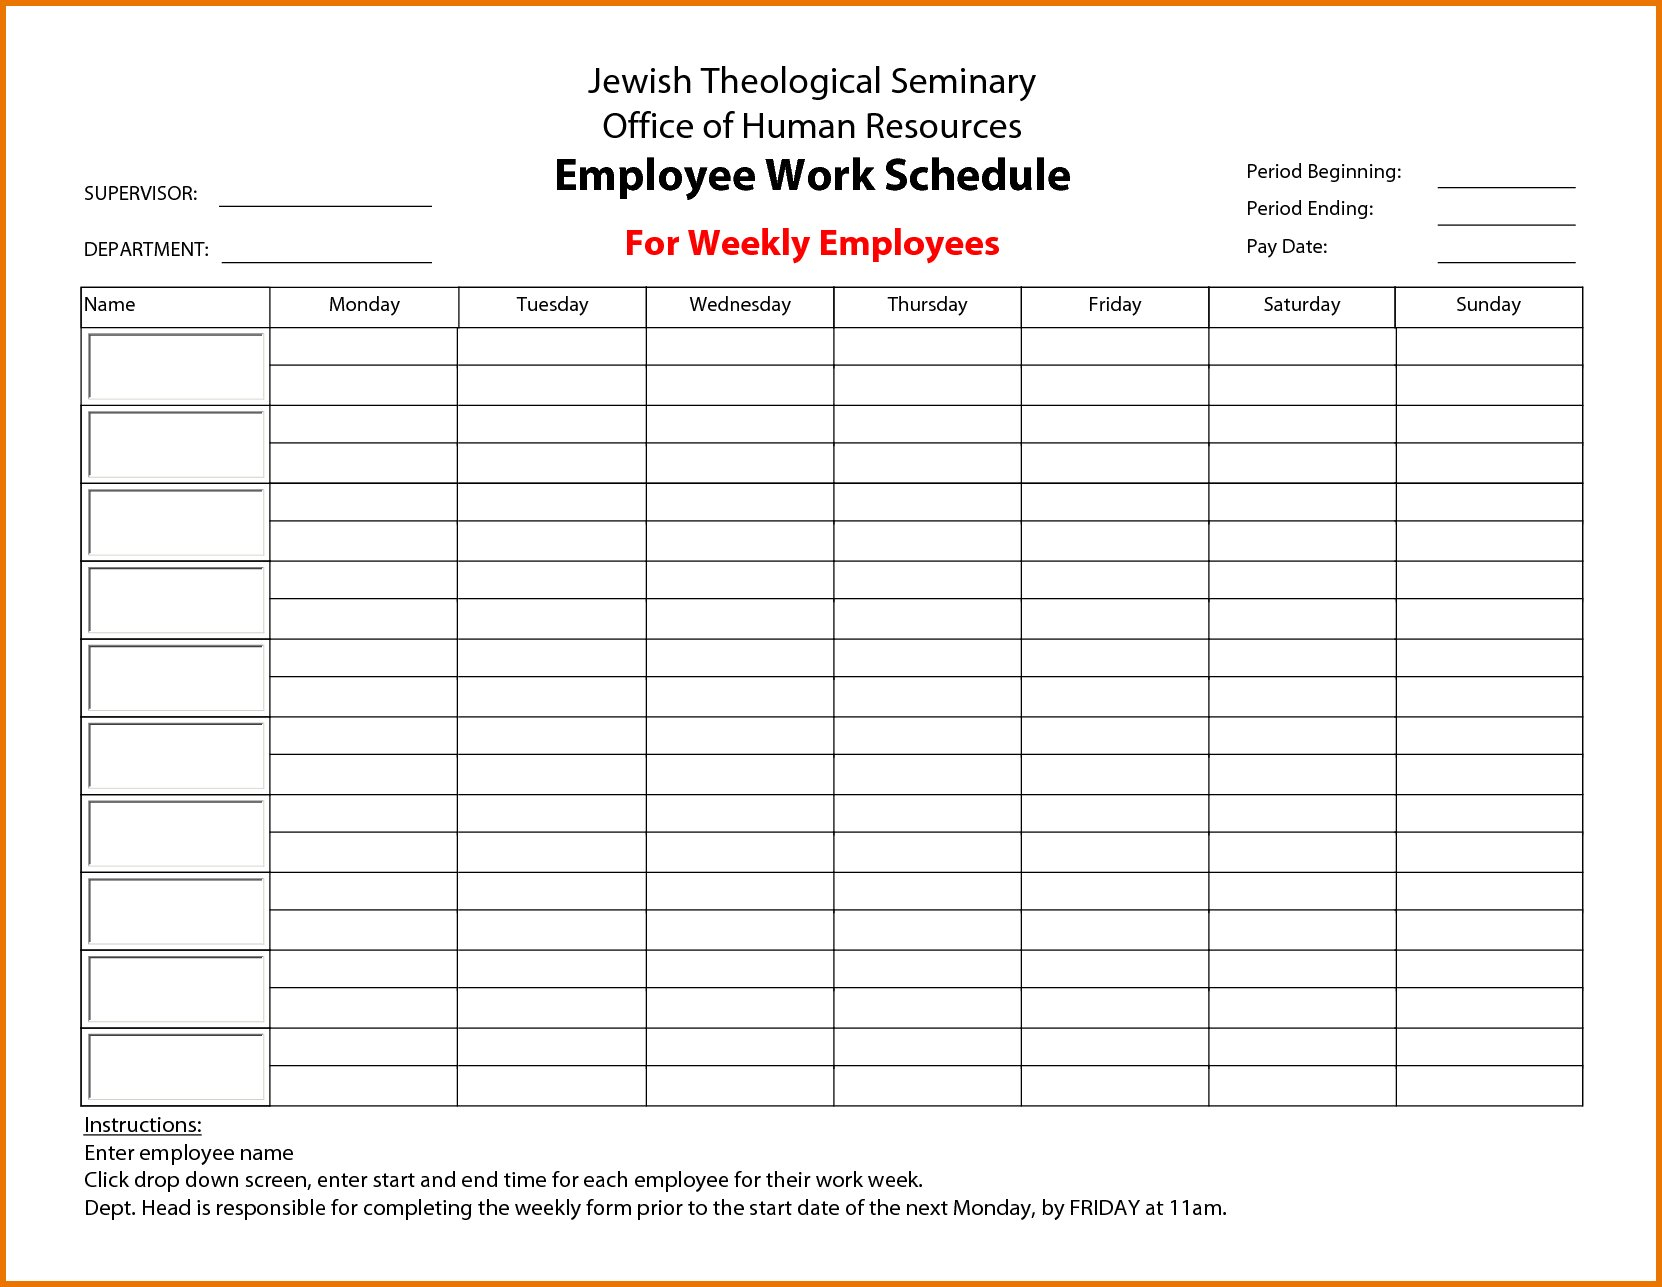 Calendar Employee Schedule Template – Printable Schedule Free Sunday Through Saturday Scheduling Calender